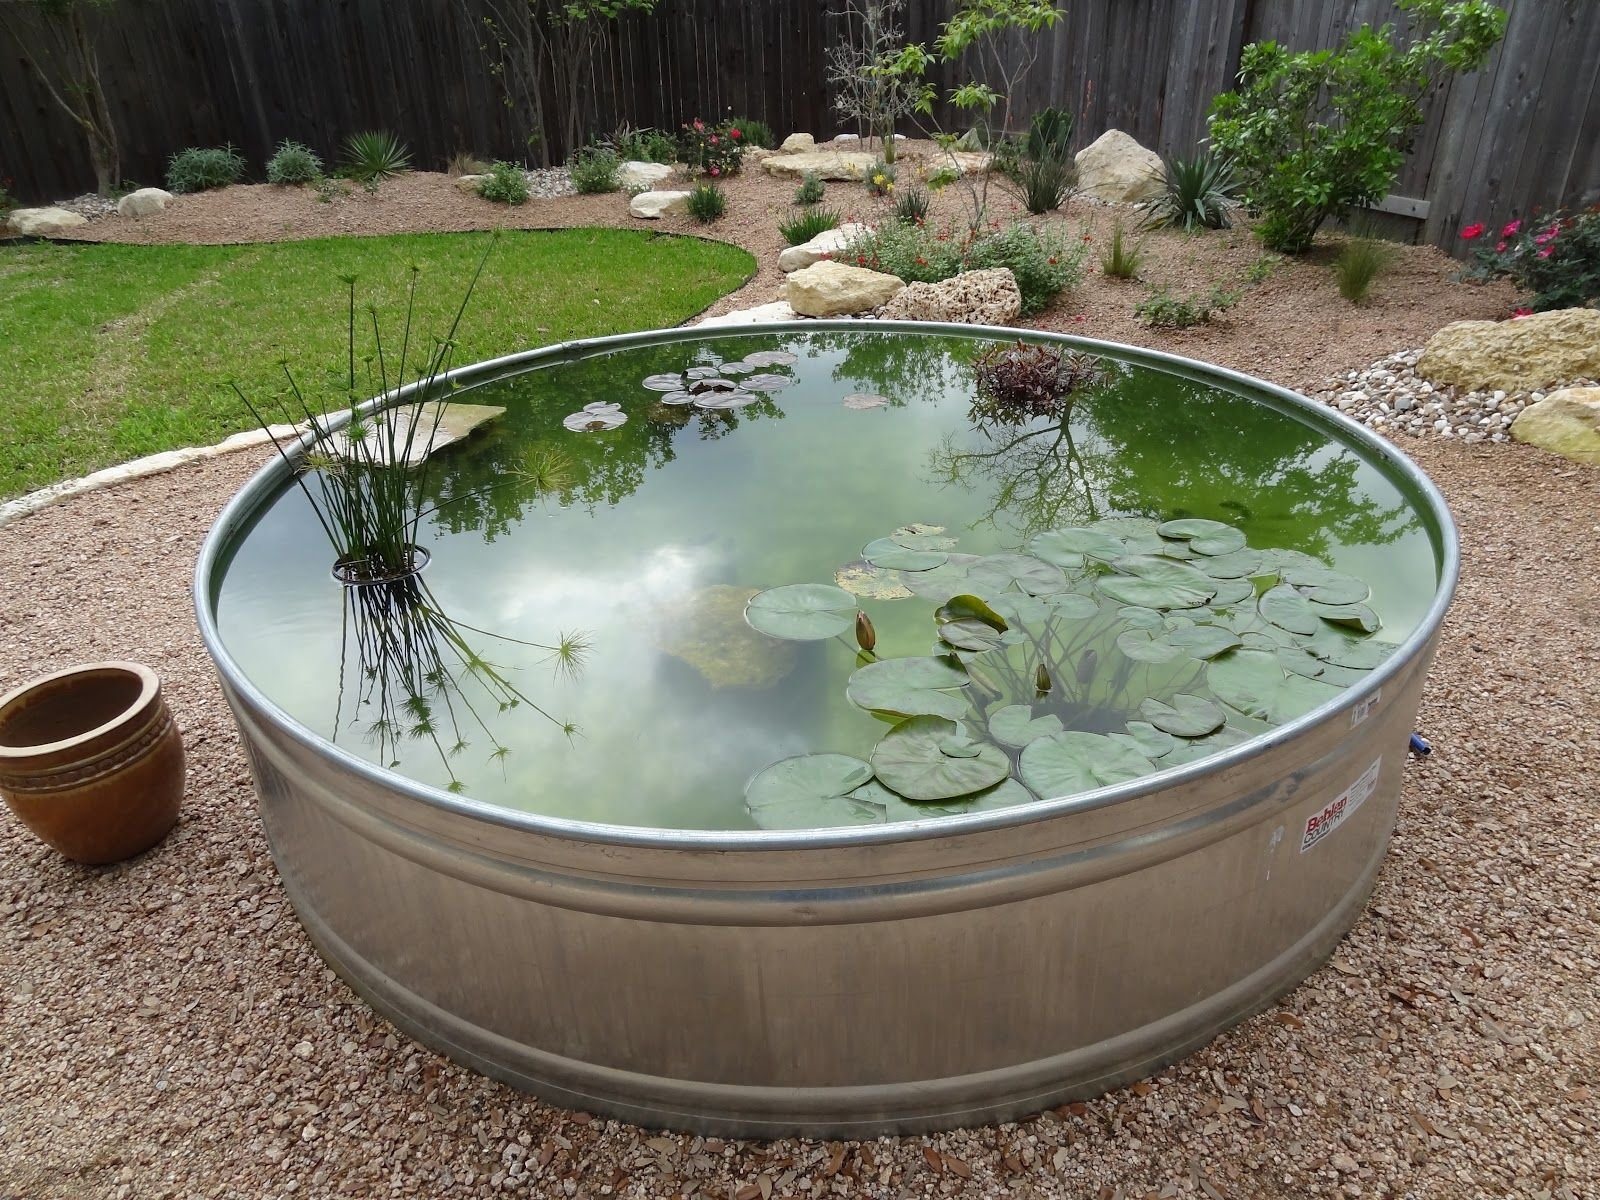 13 Gorgeous Garden Pond Ideas Ponds Backyard Water Features In The Garden Fountains Outdoor